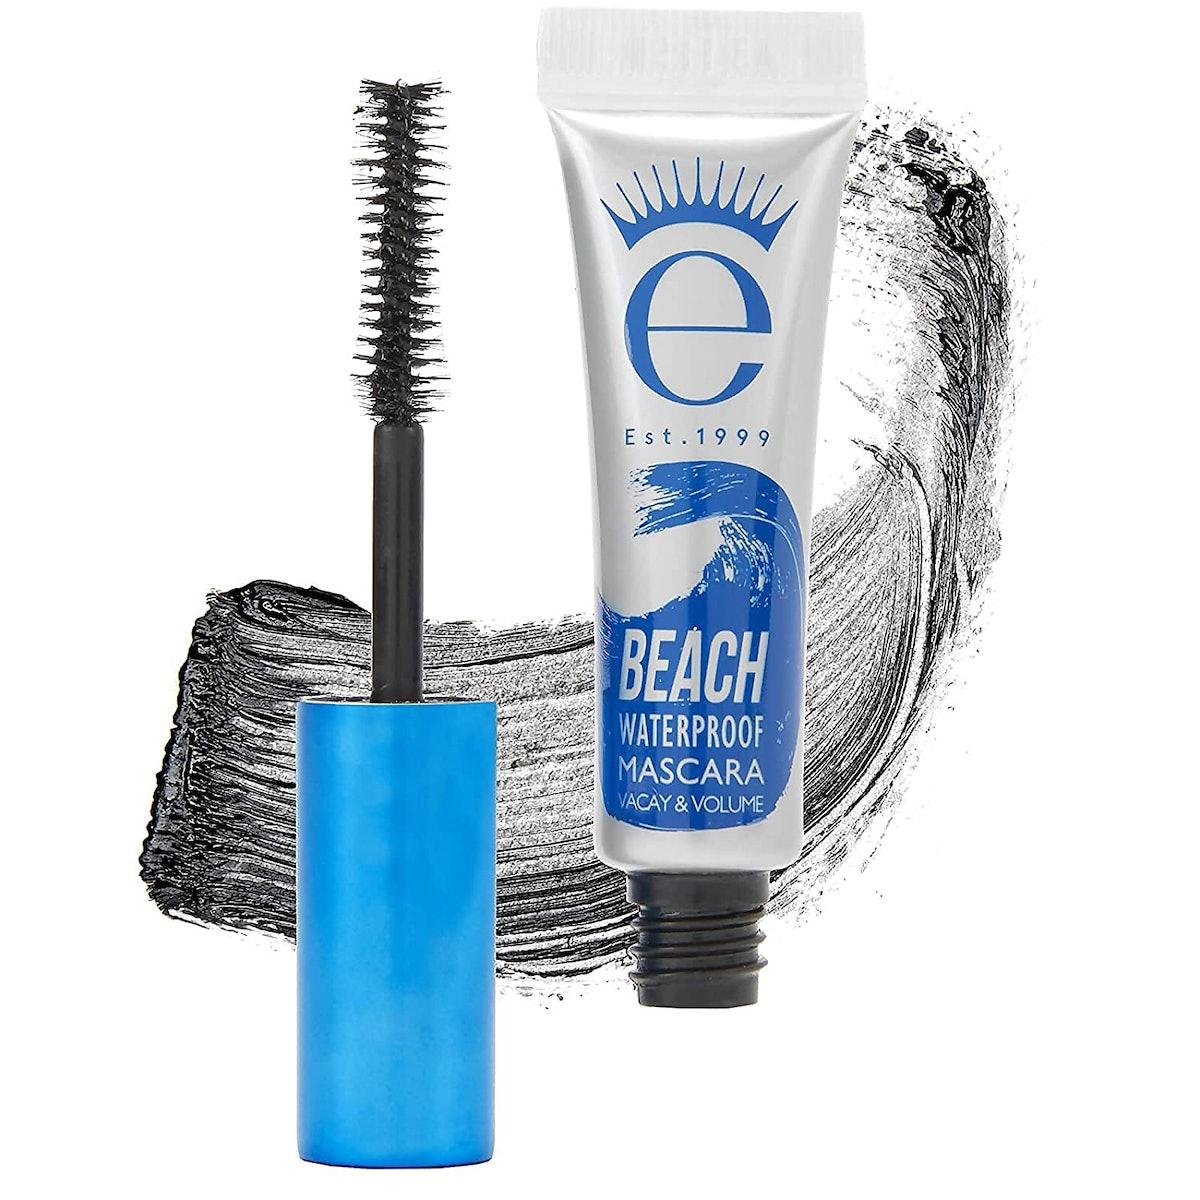 Eyeko Beach Waterproof Mascara